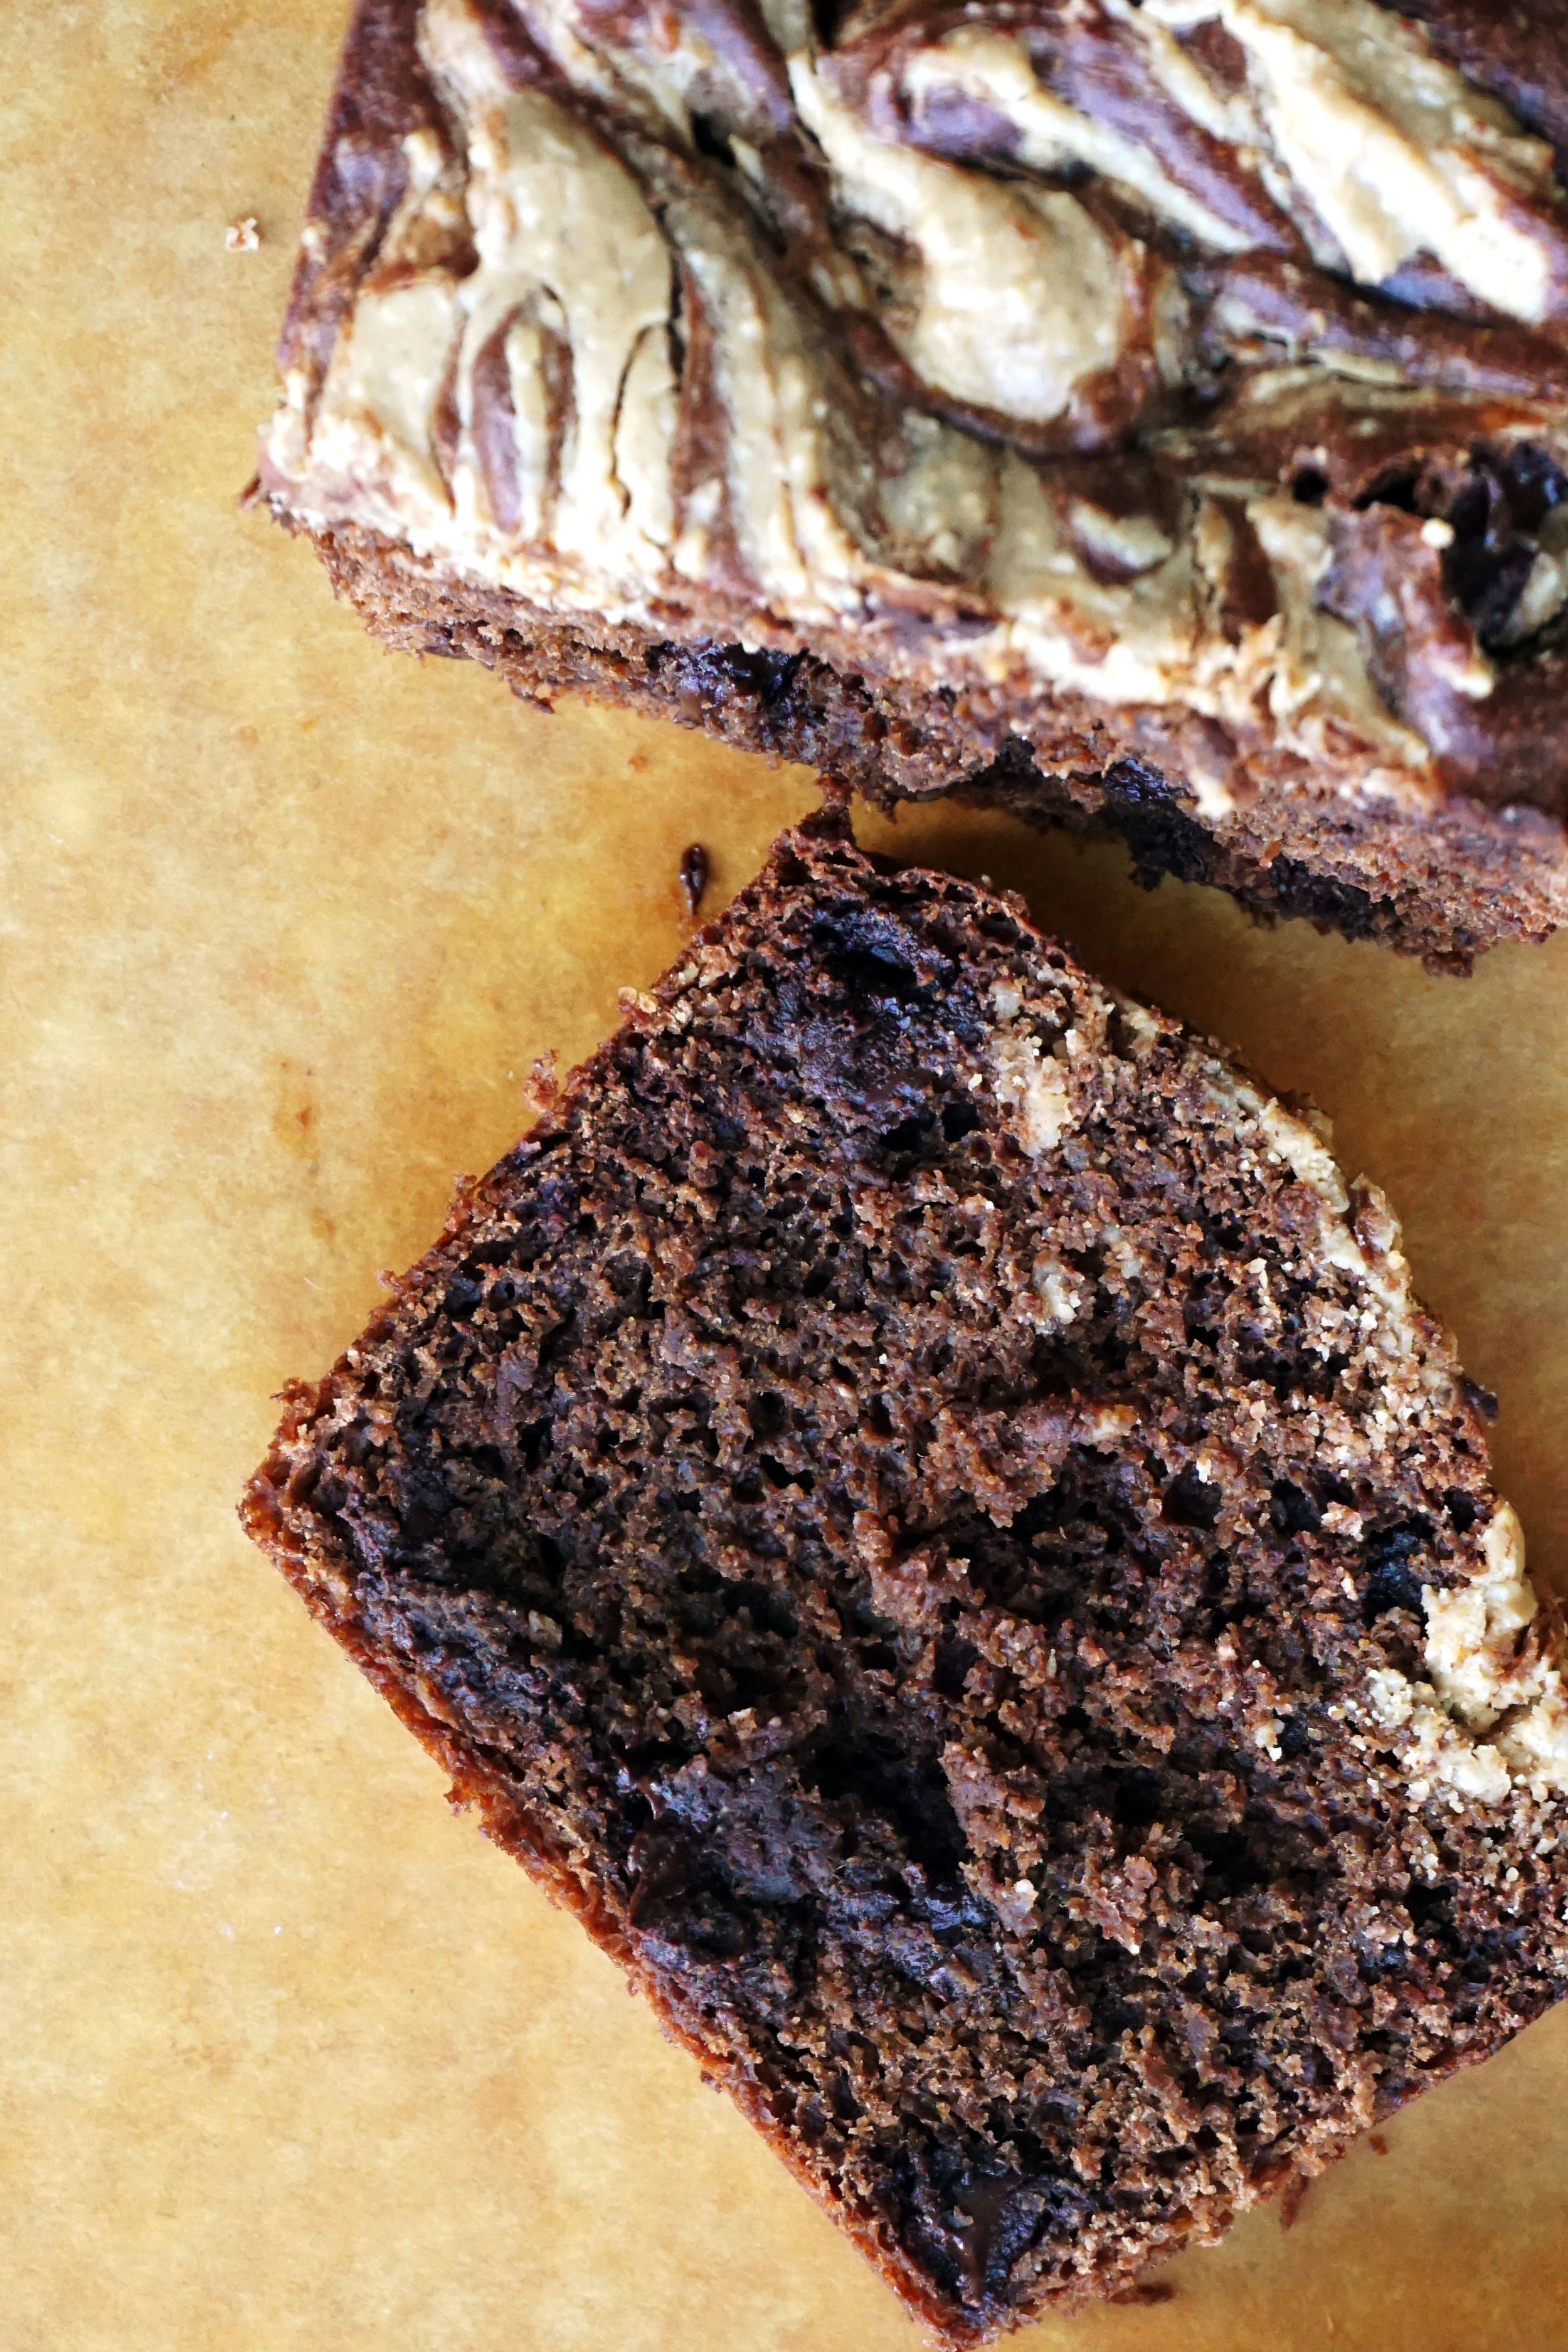 Peanut Butter Swirl Chocolate Banana Bread (GF, Grain-free)